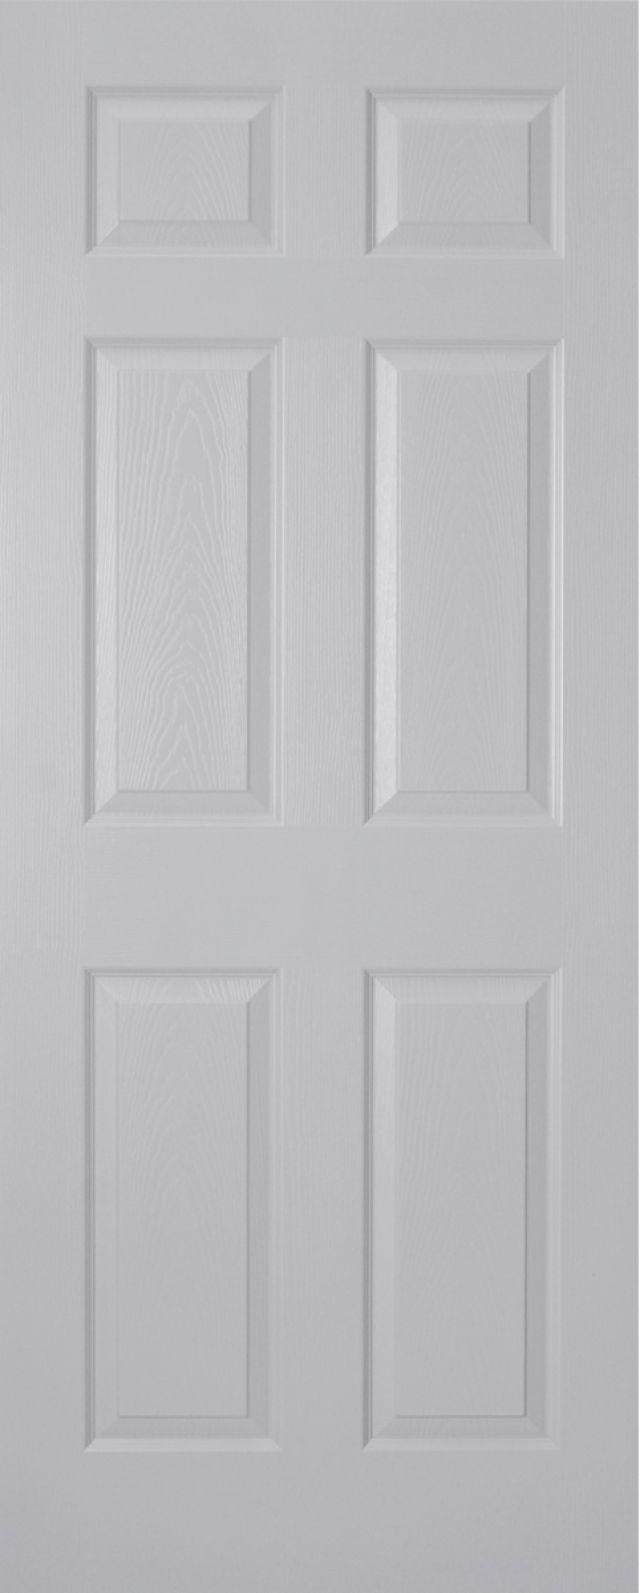 XB1  sc 1 st  Hume Doors & Hume Doors